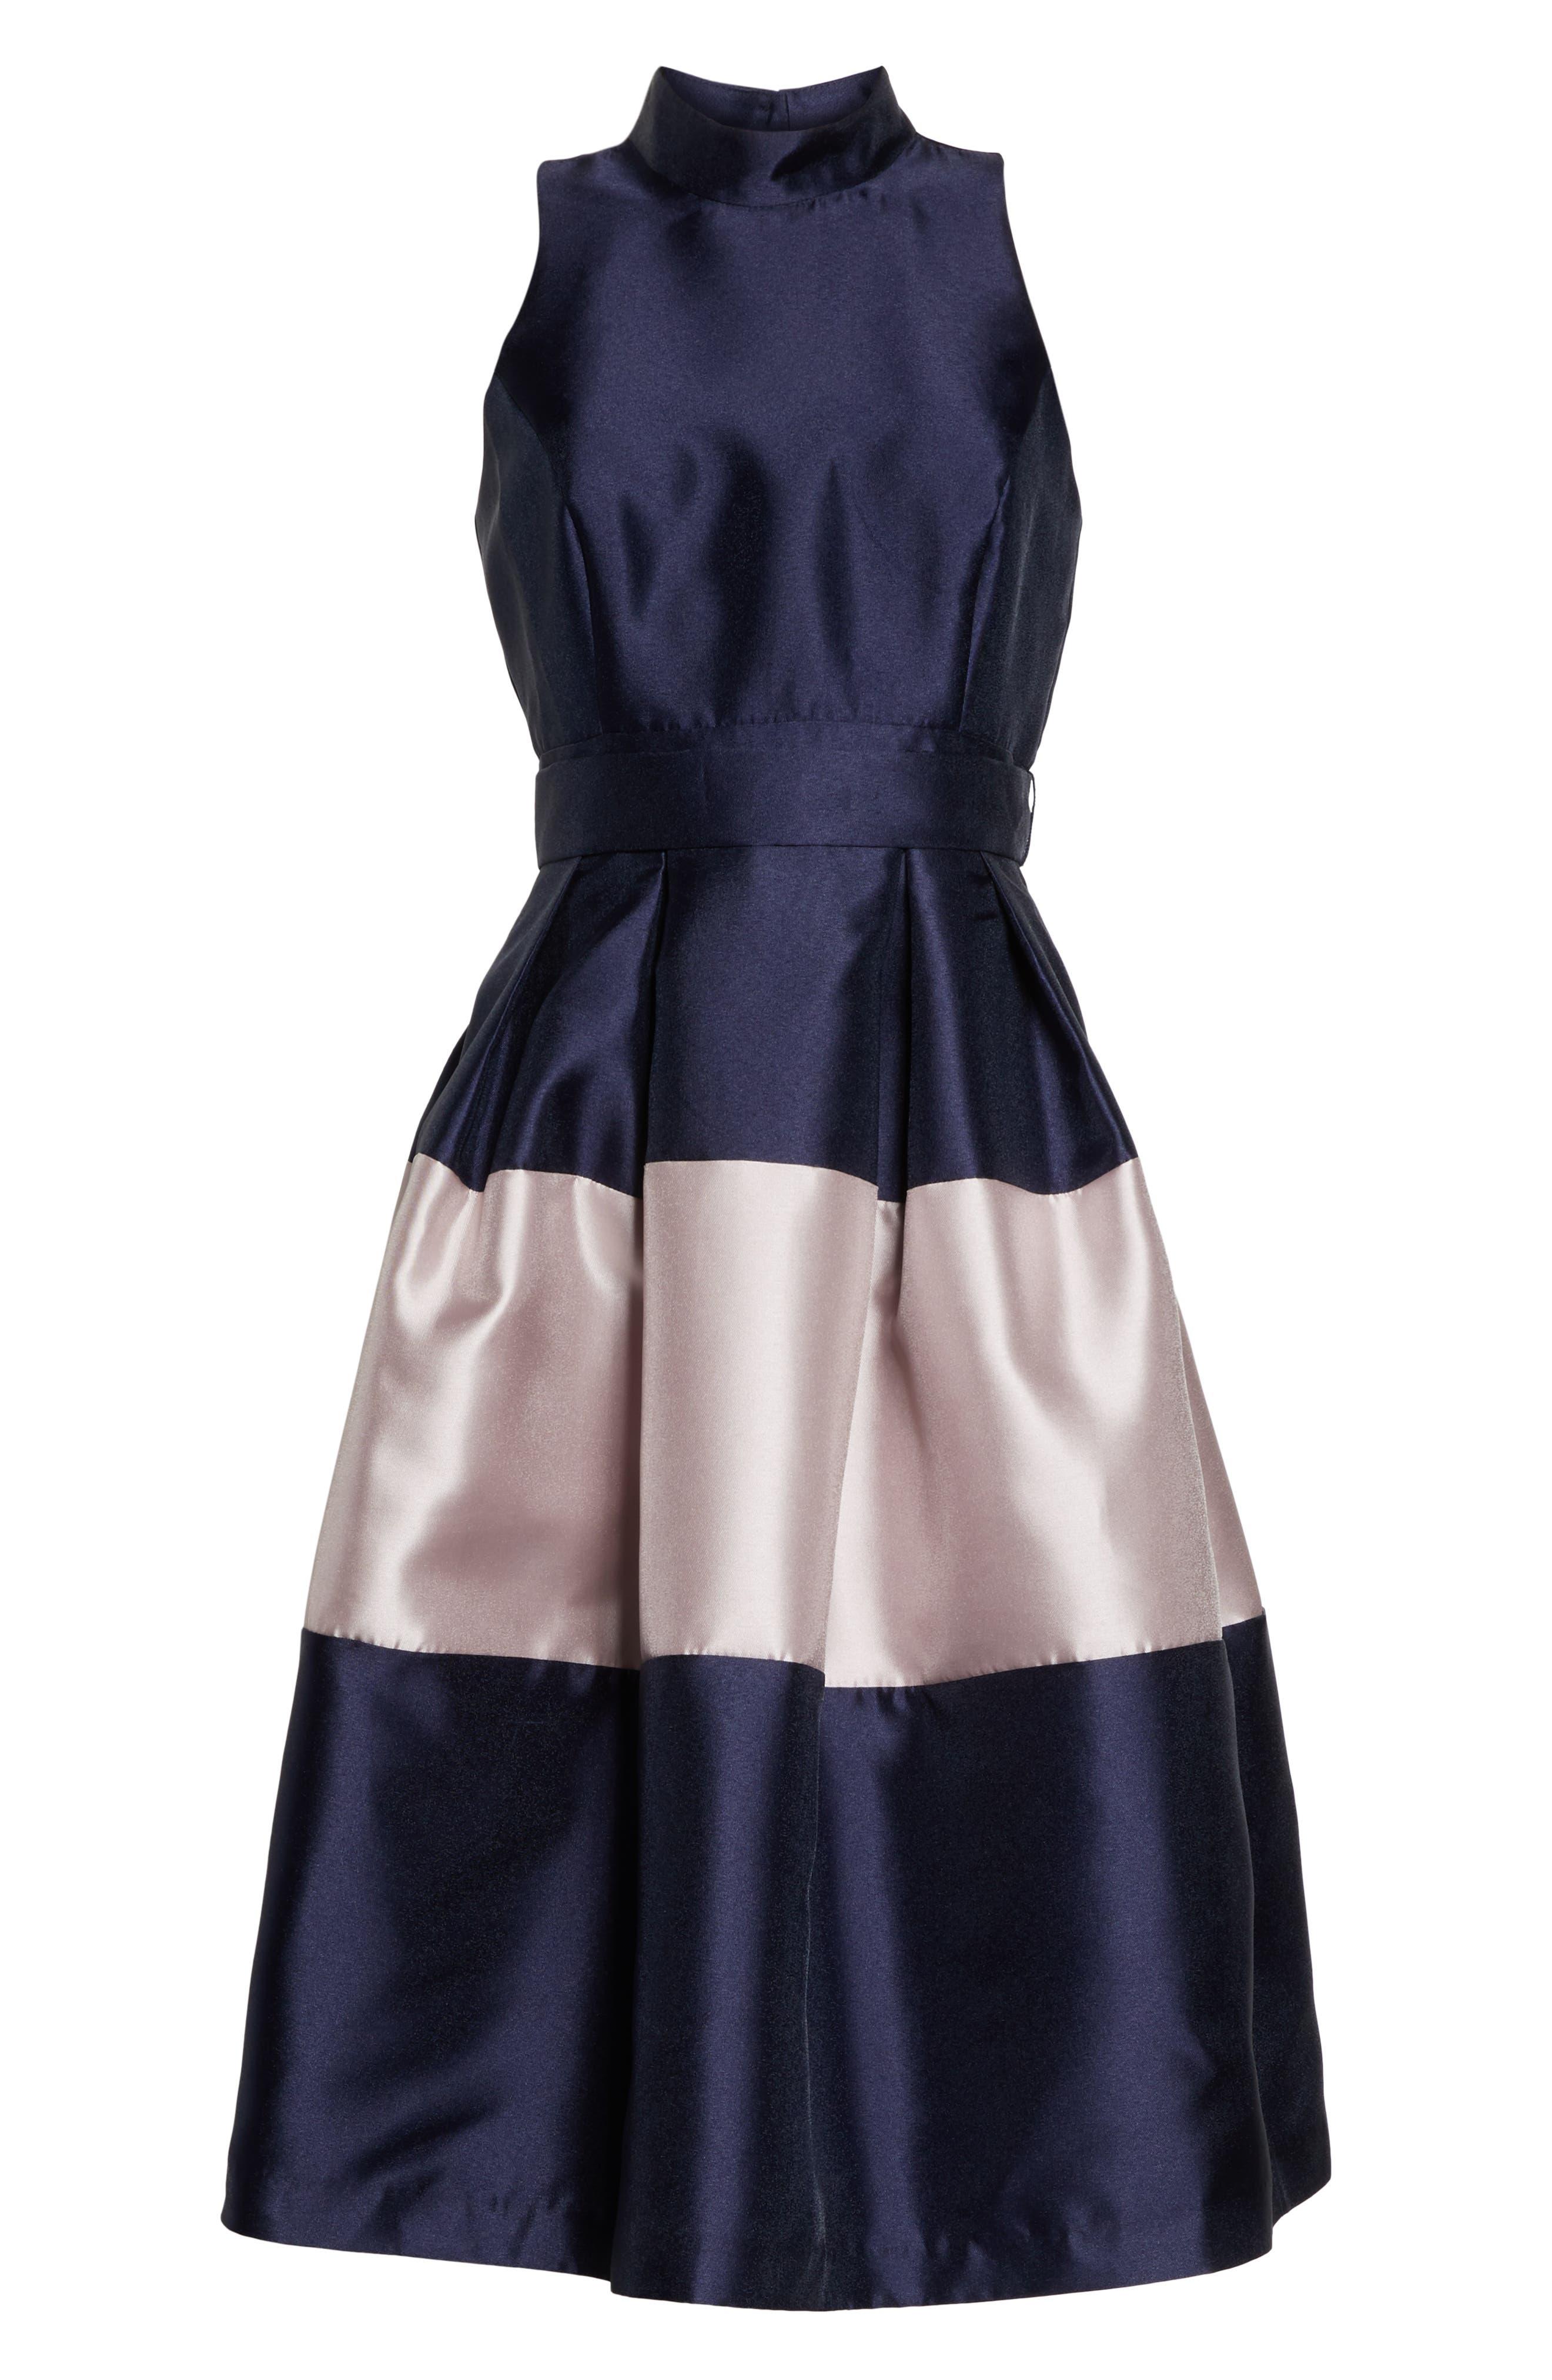 1901,                             Colorblock Fit & Flare Dress,                             Alternate thumbnail 7, color,                             NAVY SAPPHIRE